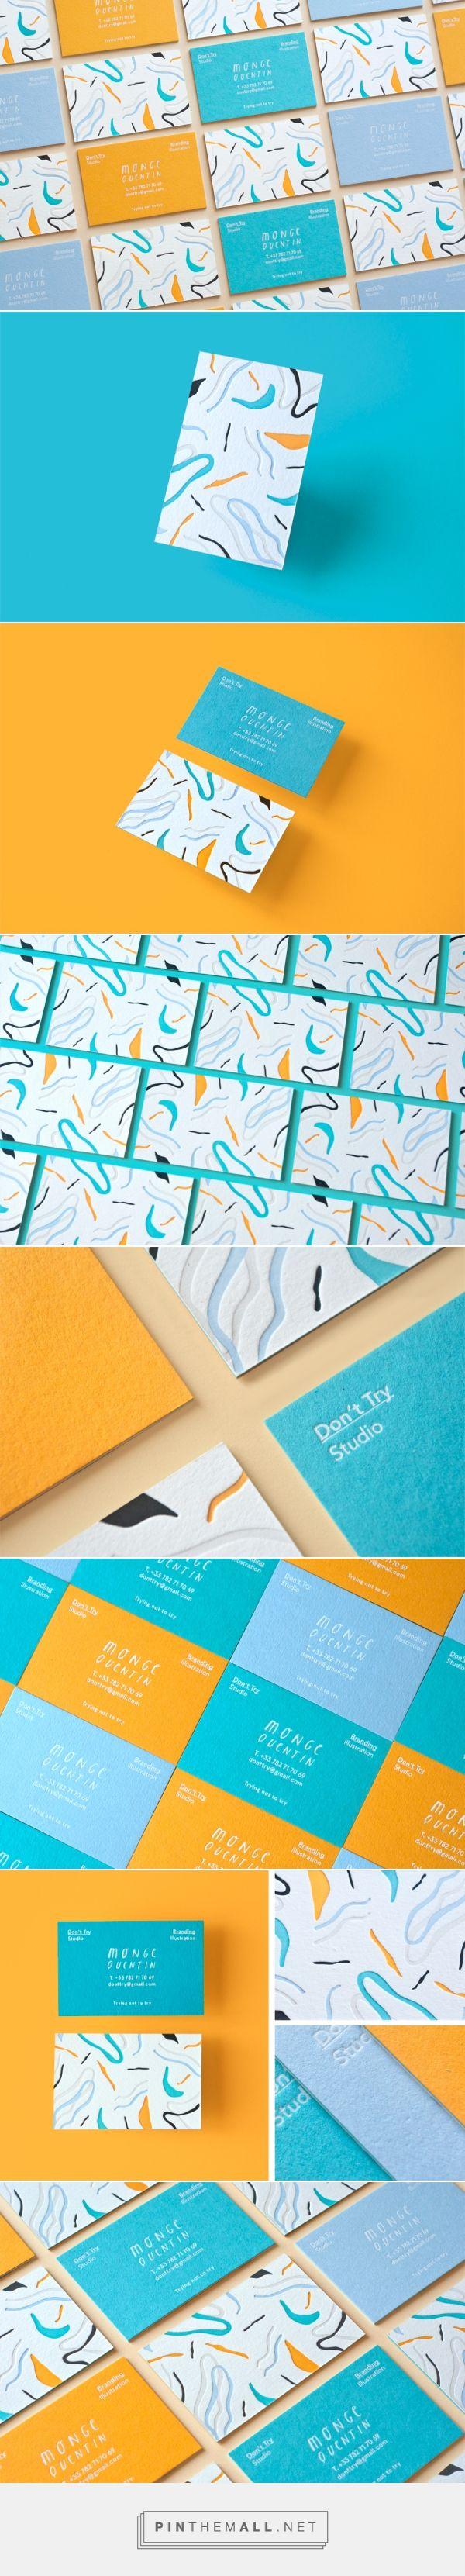 Don't Try Studio - Business Cards on Behance | Set of colorful business cards. White foil / 5 color letterpress on triplex colorplan paper.